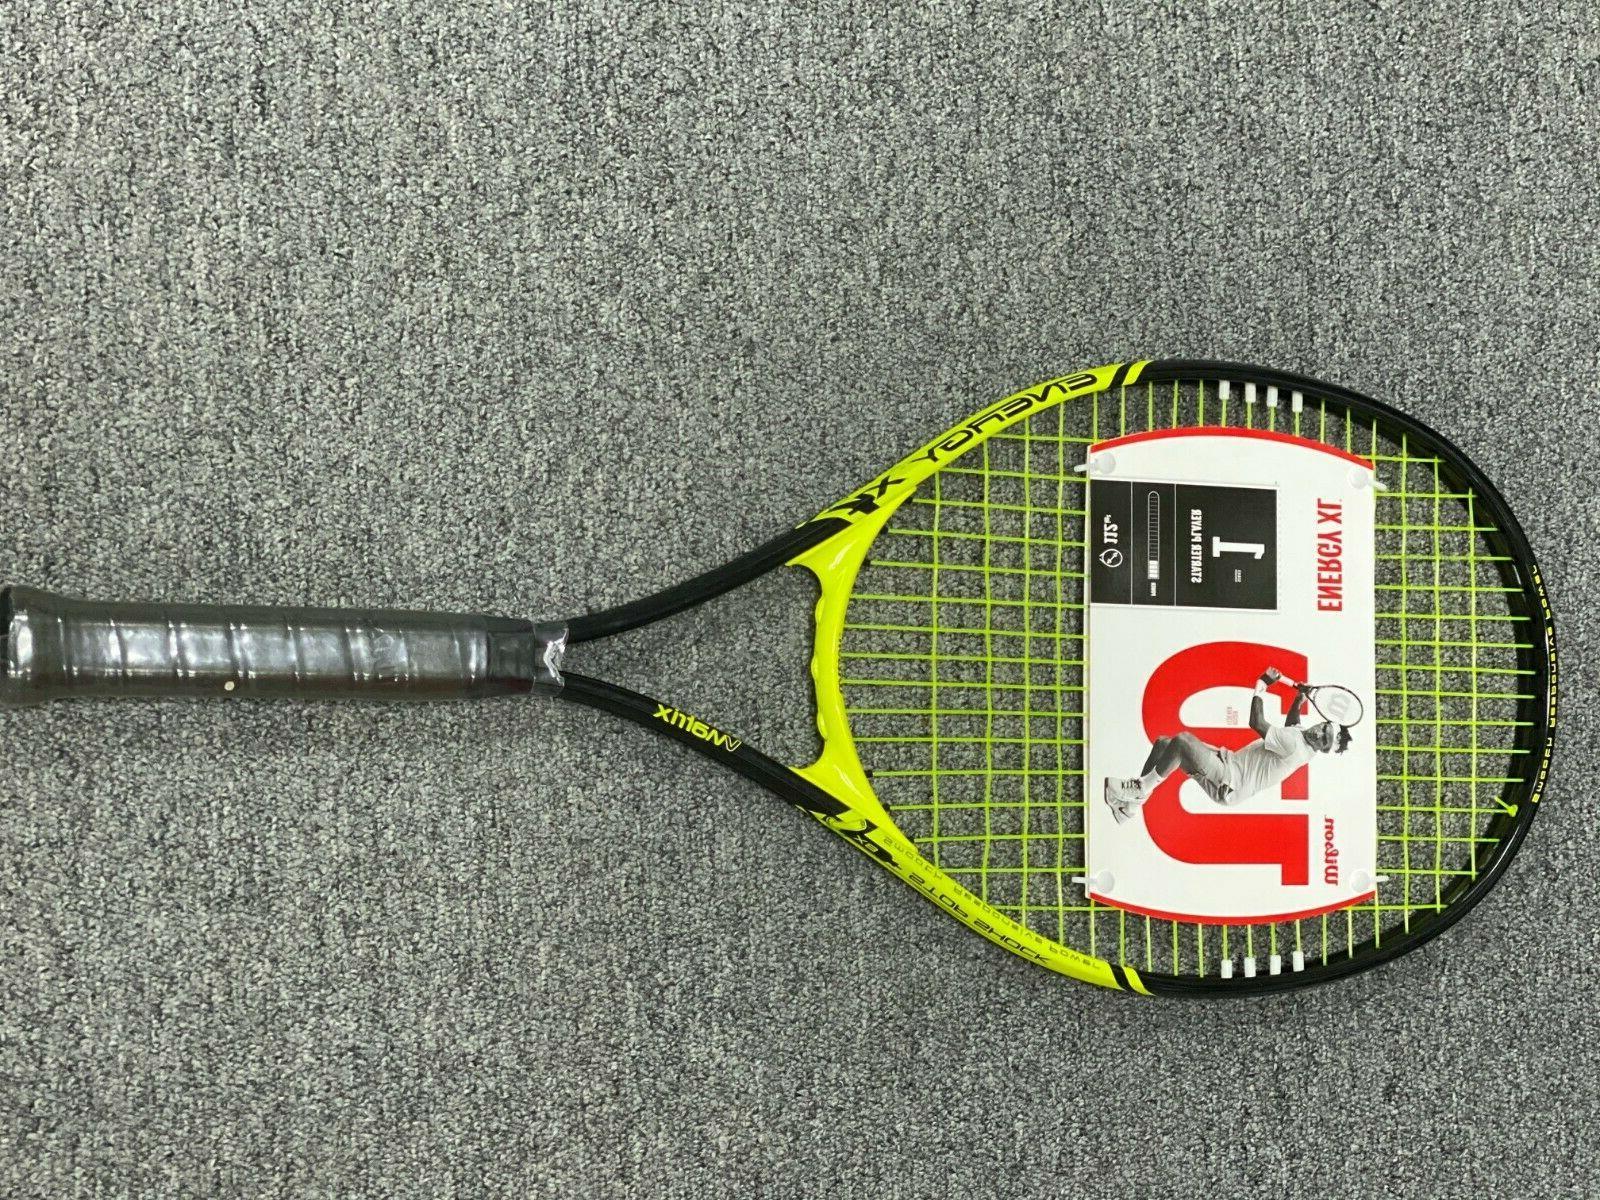 energy xl vmatrix tennis racket pre strung